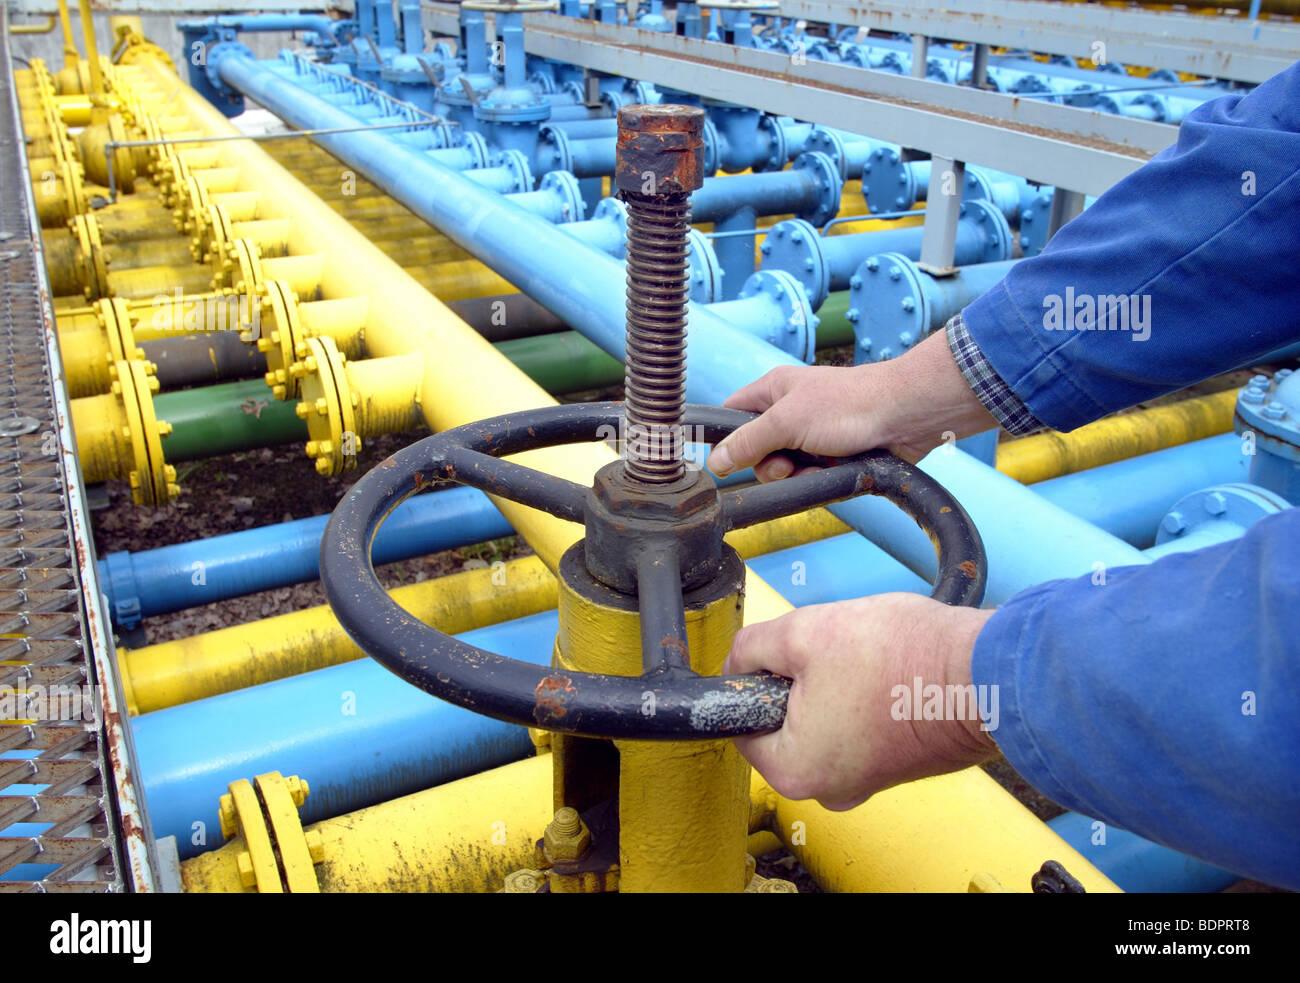 Ventile Stock Photos & Ventile Stock Images - Alamy